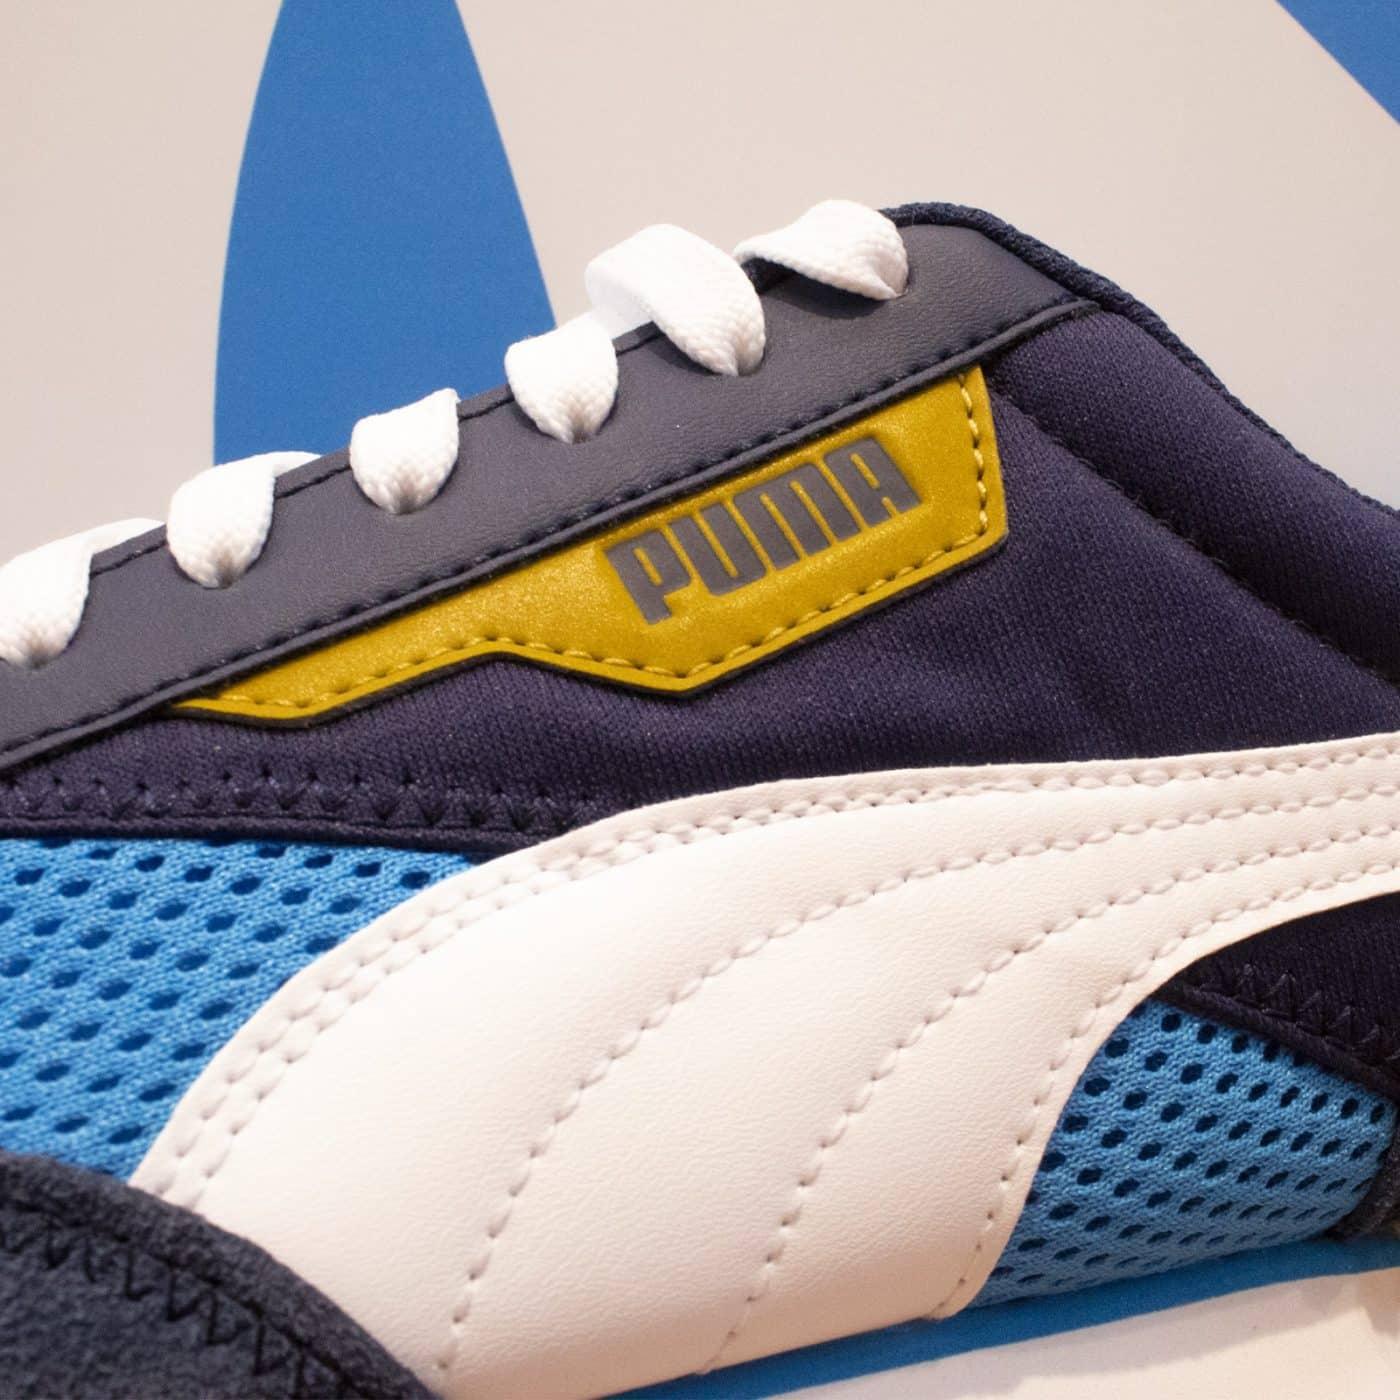 puma-rider-om-marseille-sneakers-5